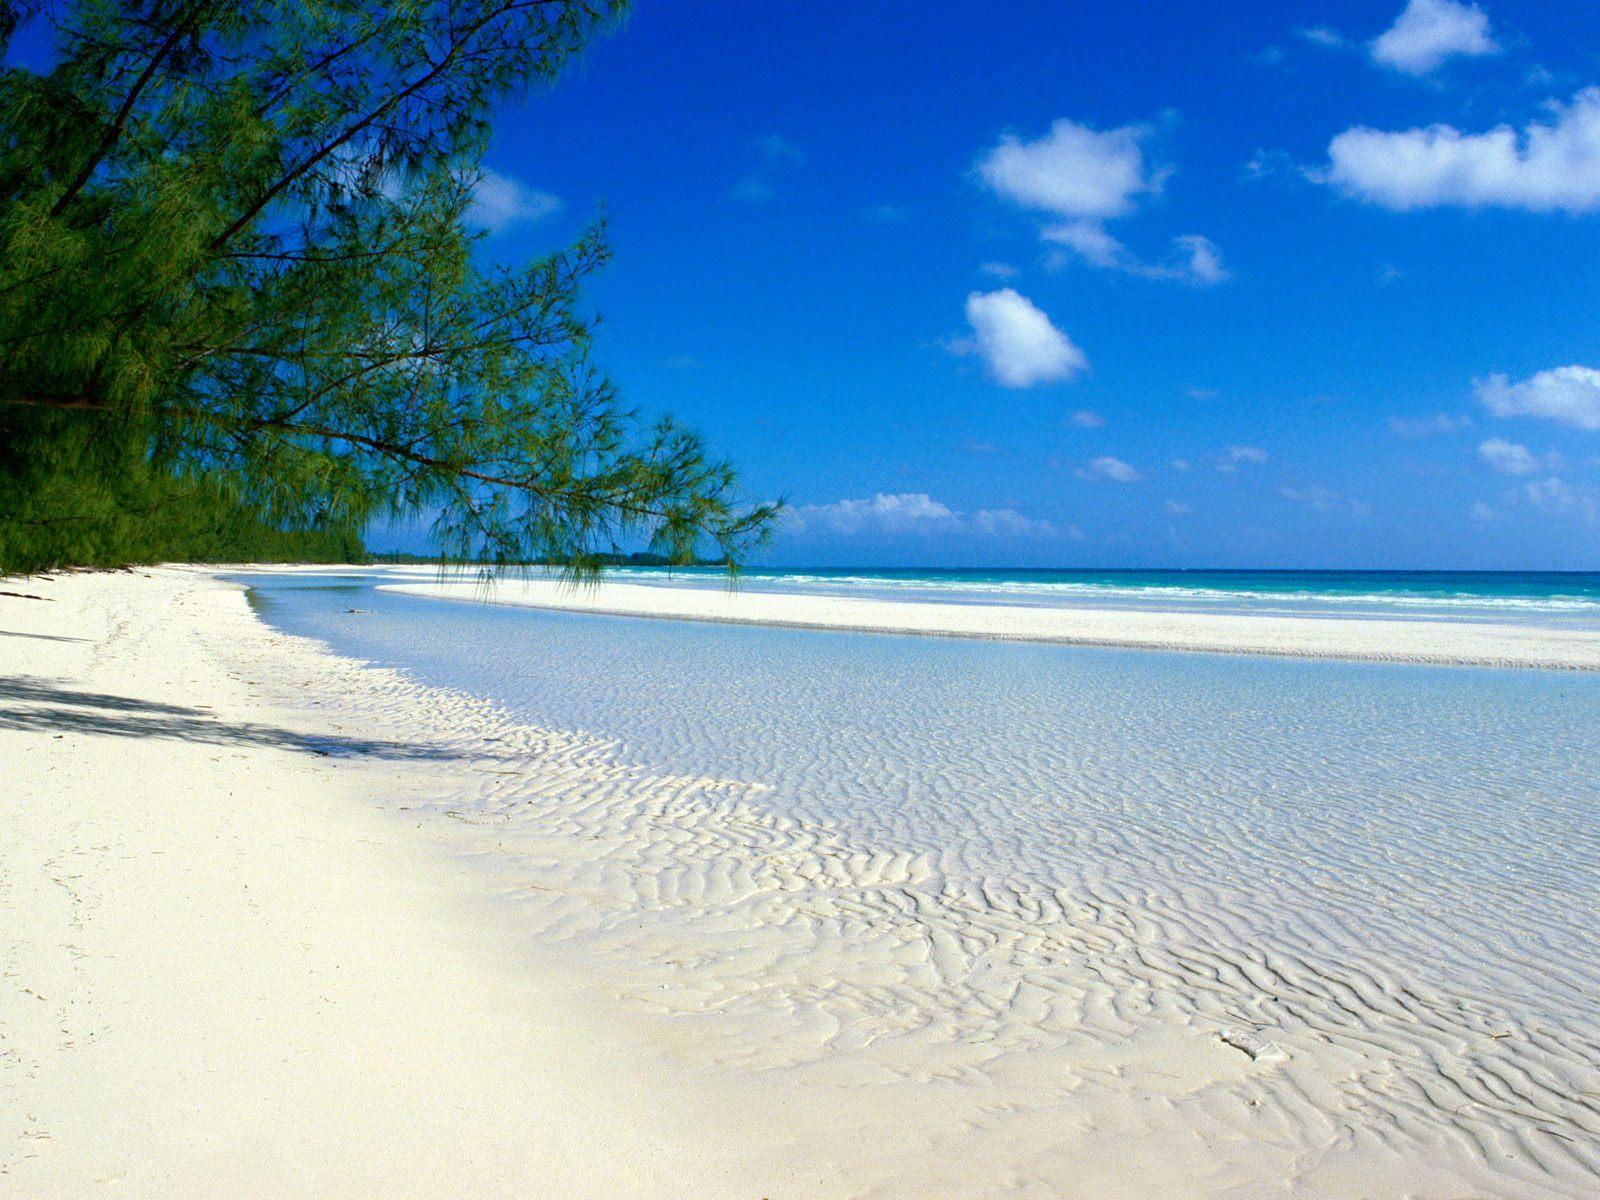 http://1.bp.blogspot.com/_6vQUmqm2JkQ/TTvsPLUsoBI/AAAAAAAAHwc/o8NwH2GFDTE/s1600/paos-of-Taino-Beach-Bahamas-pictures.jpg